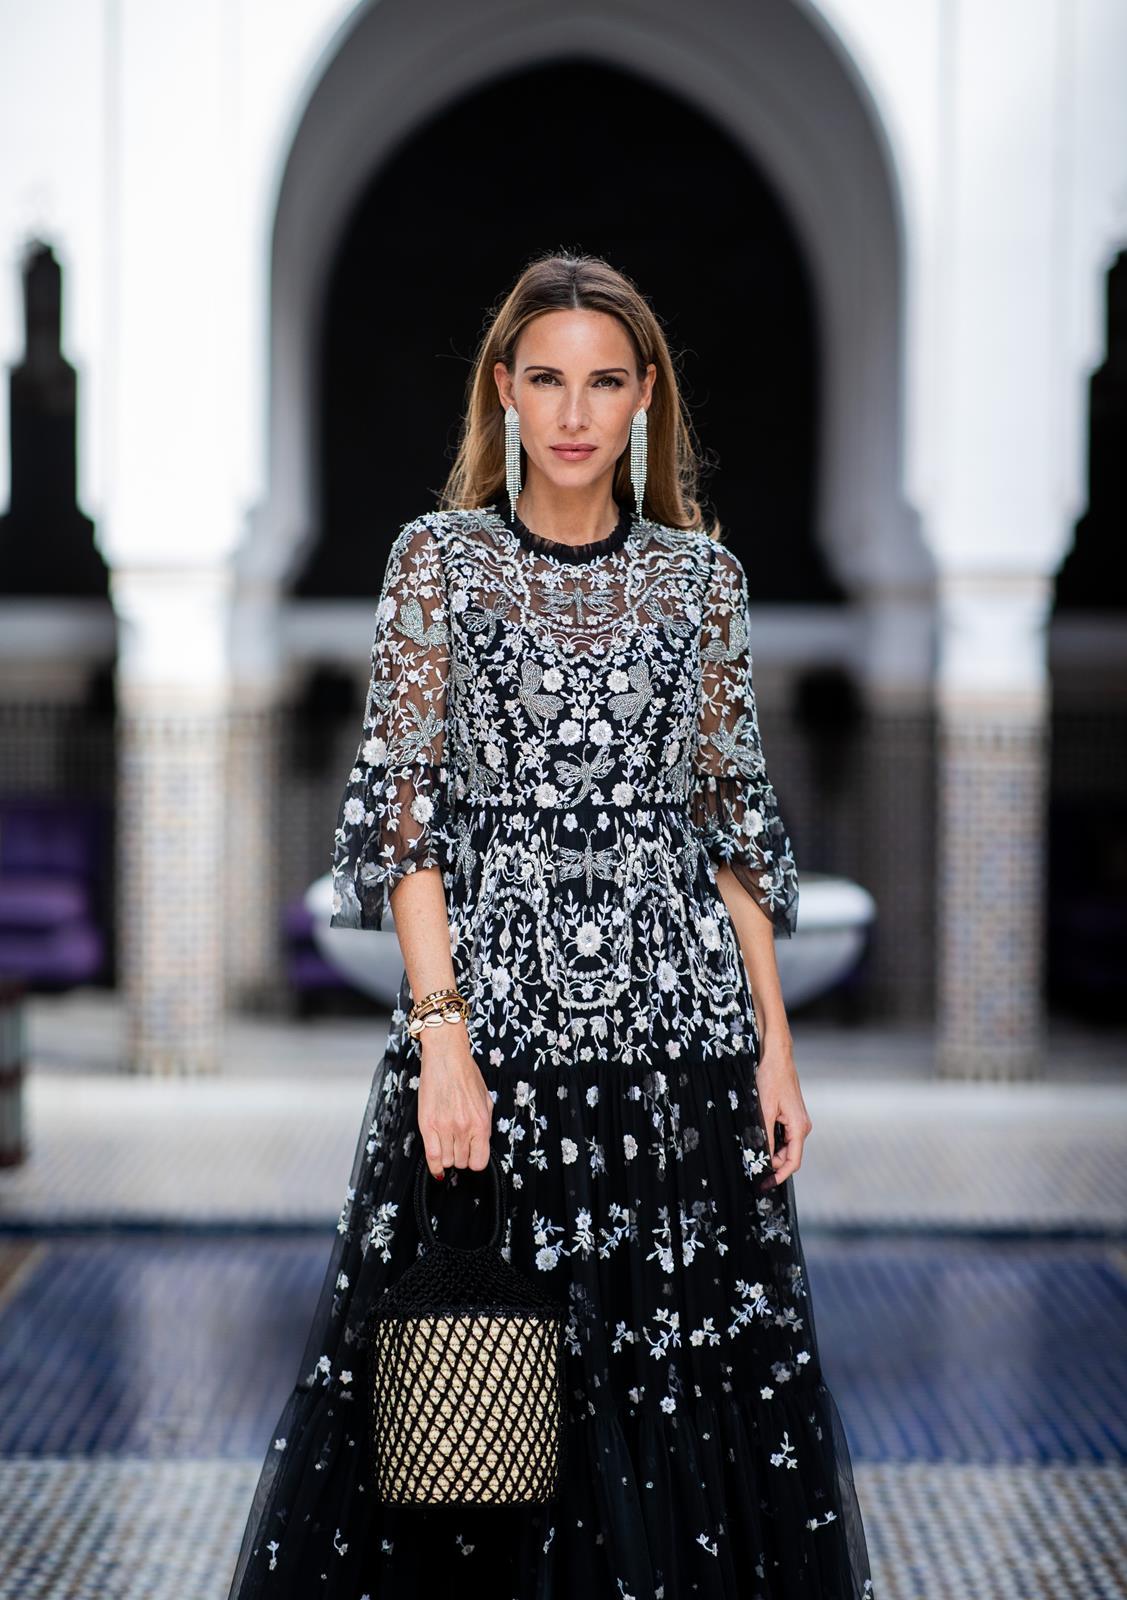 096b7799f39dd ... Alexandra Lapp in a Christmas dress Look, wearing a silver NBD dress,  ...